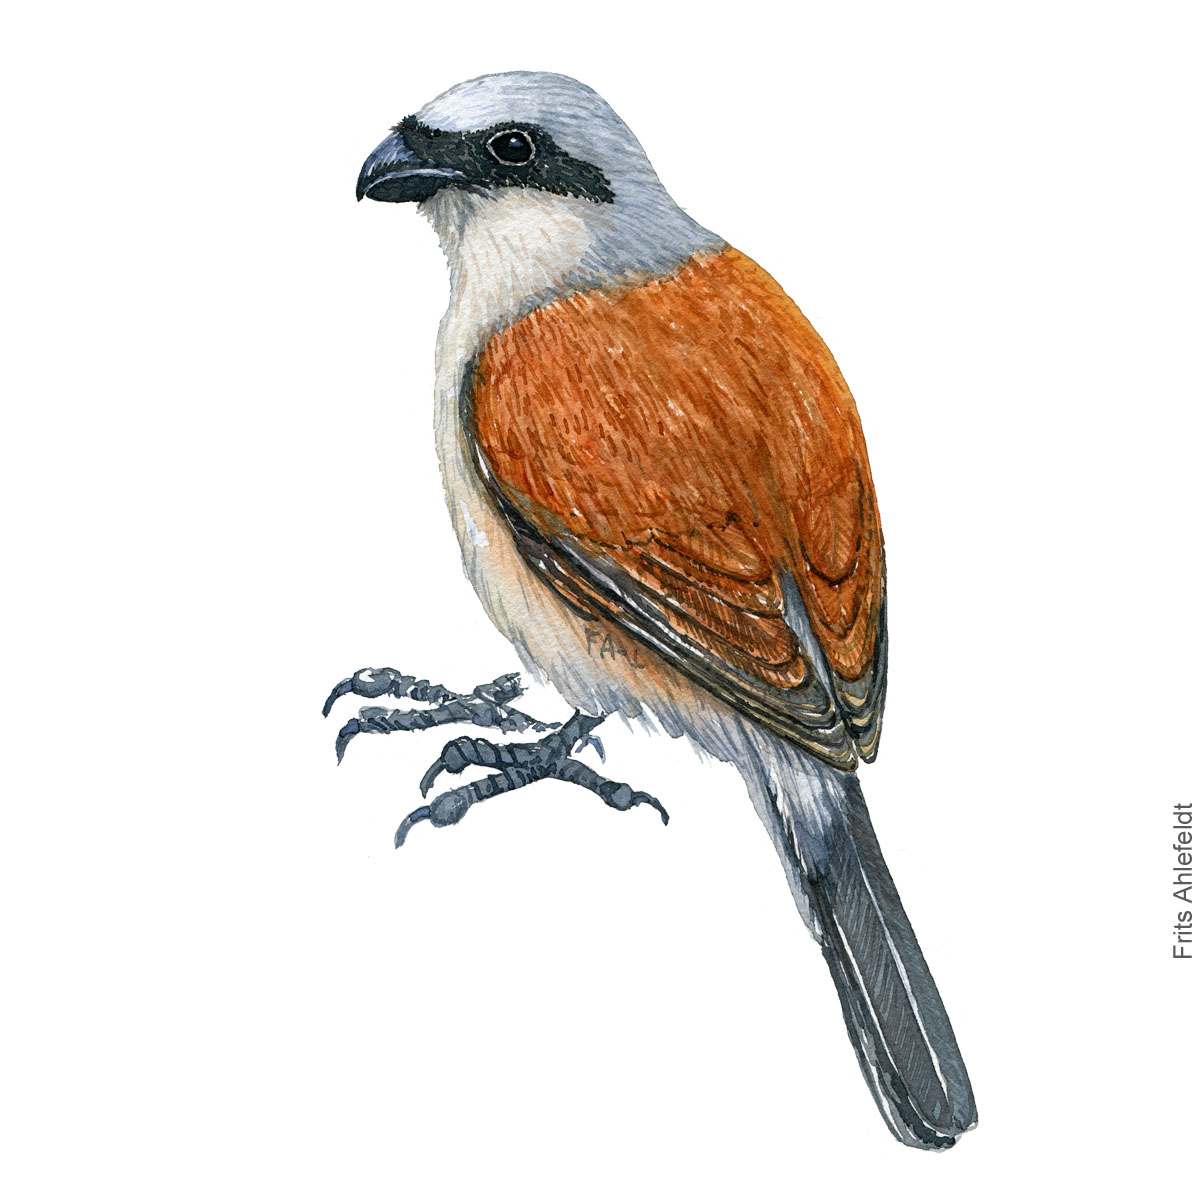 roedrygget tornskade - Red backed shrike bird watercolor illustration. Painting by Frits Ahlefeldt. Fugle akvarel